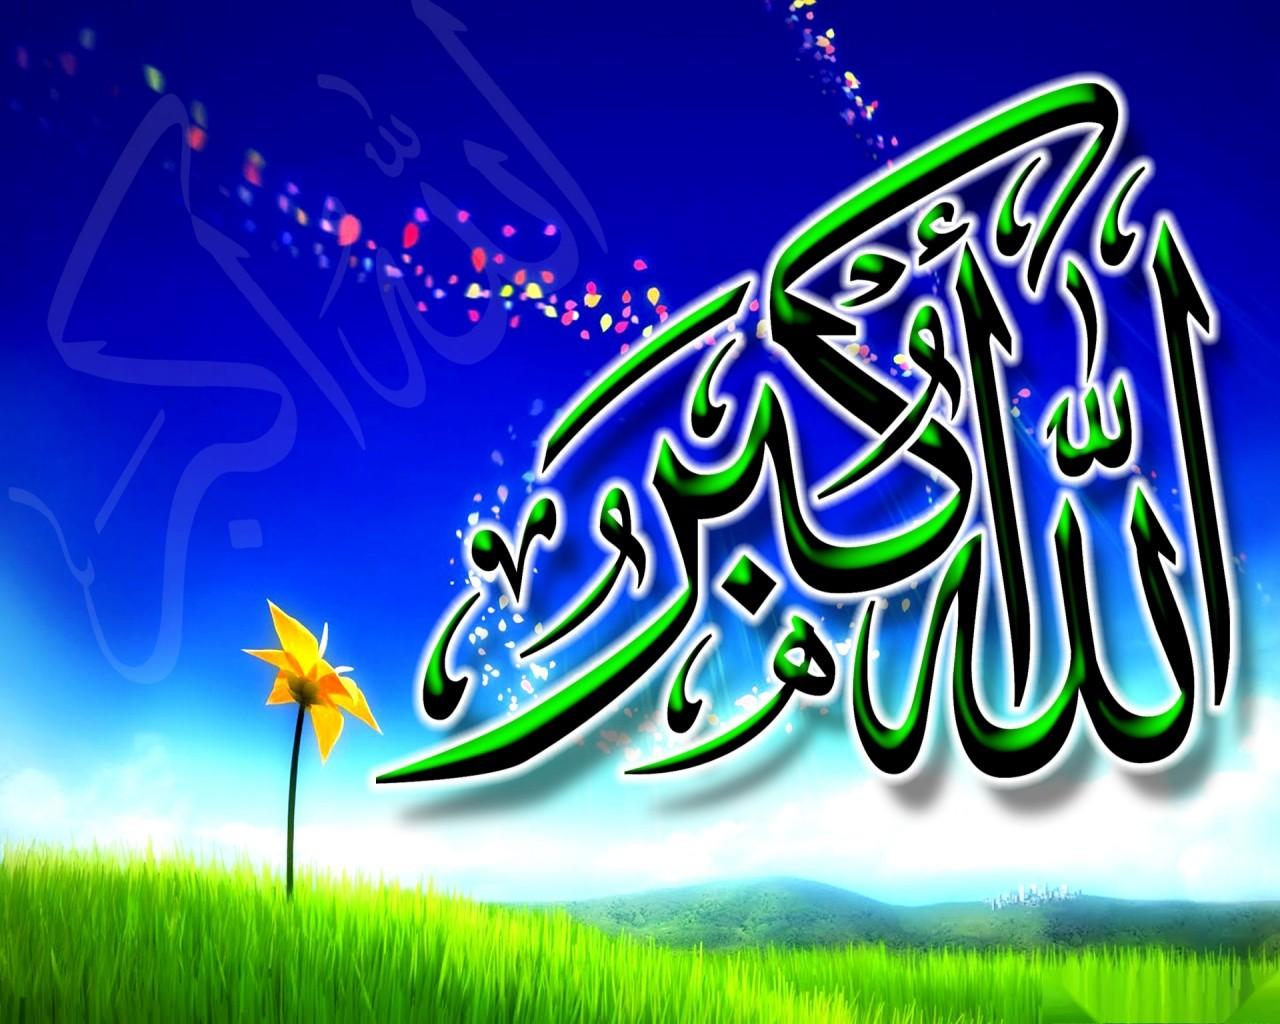 Islamic High Quality Wallpapers: New HD Natural Allah O Akbar Wallpaper